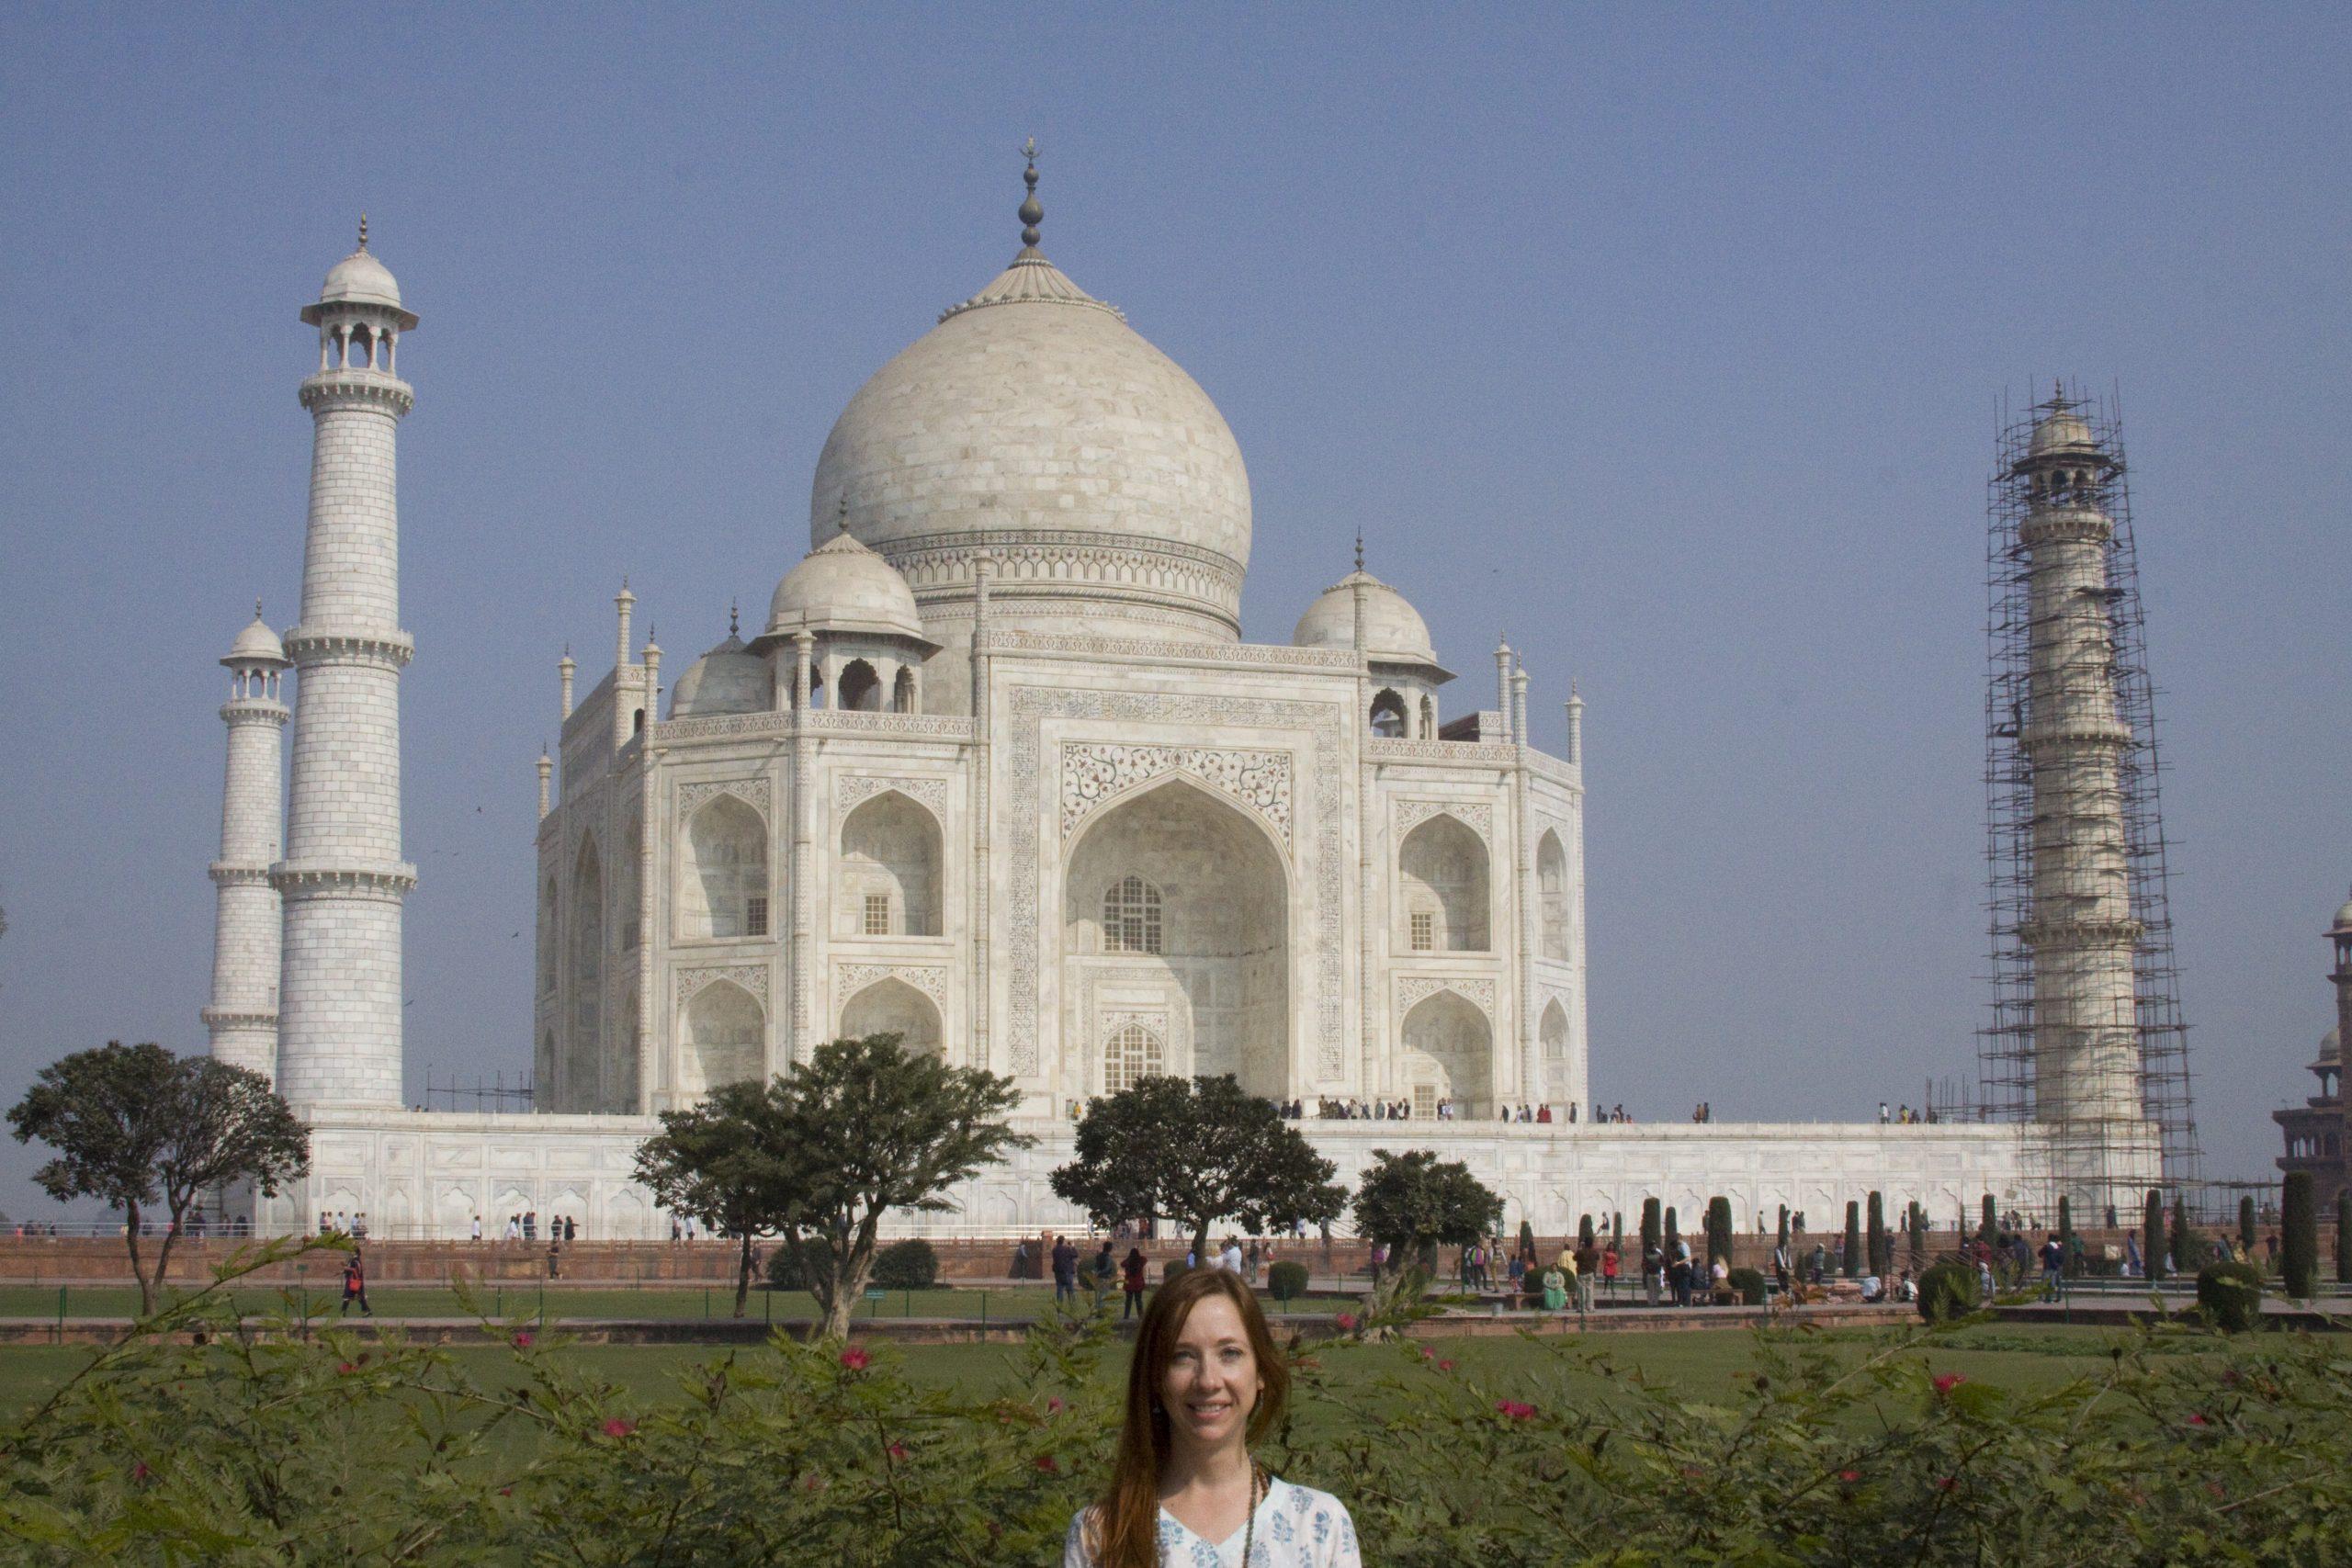 Jill in front of the Taj Mahal-India